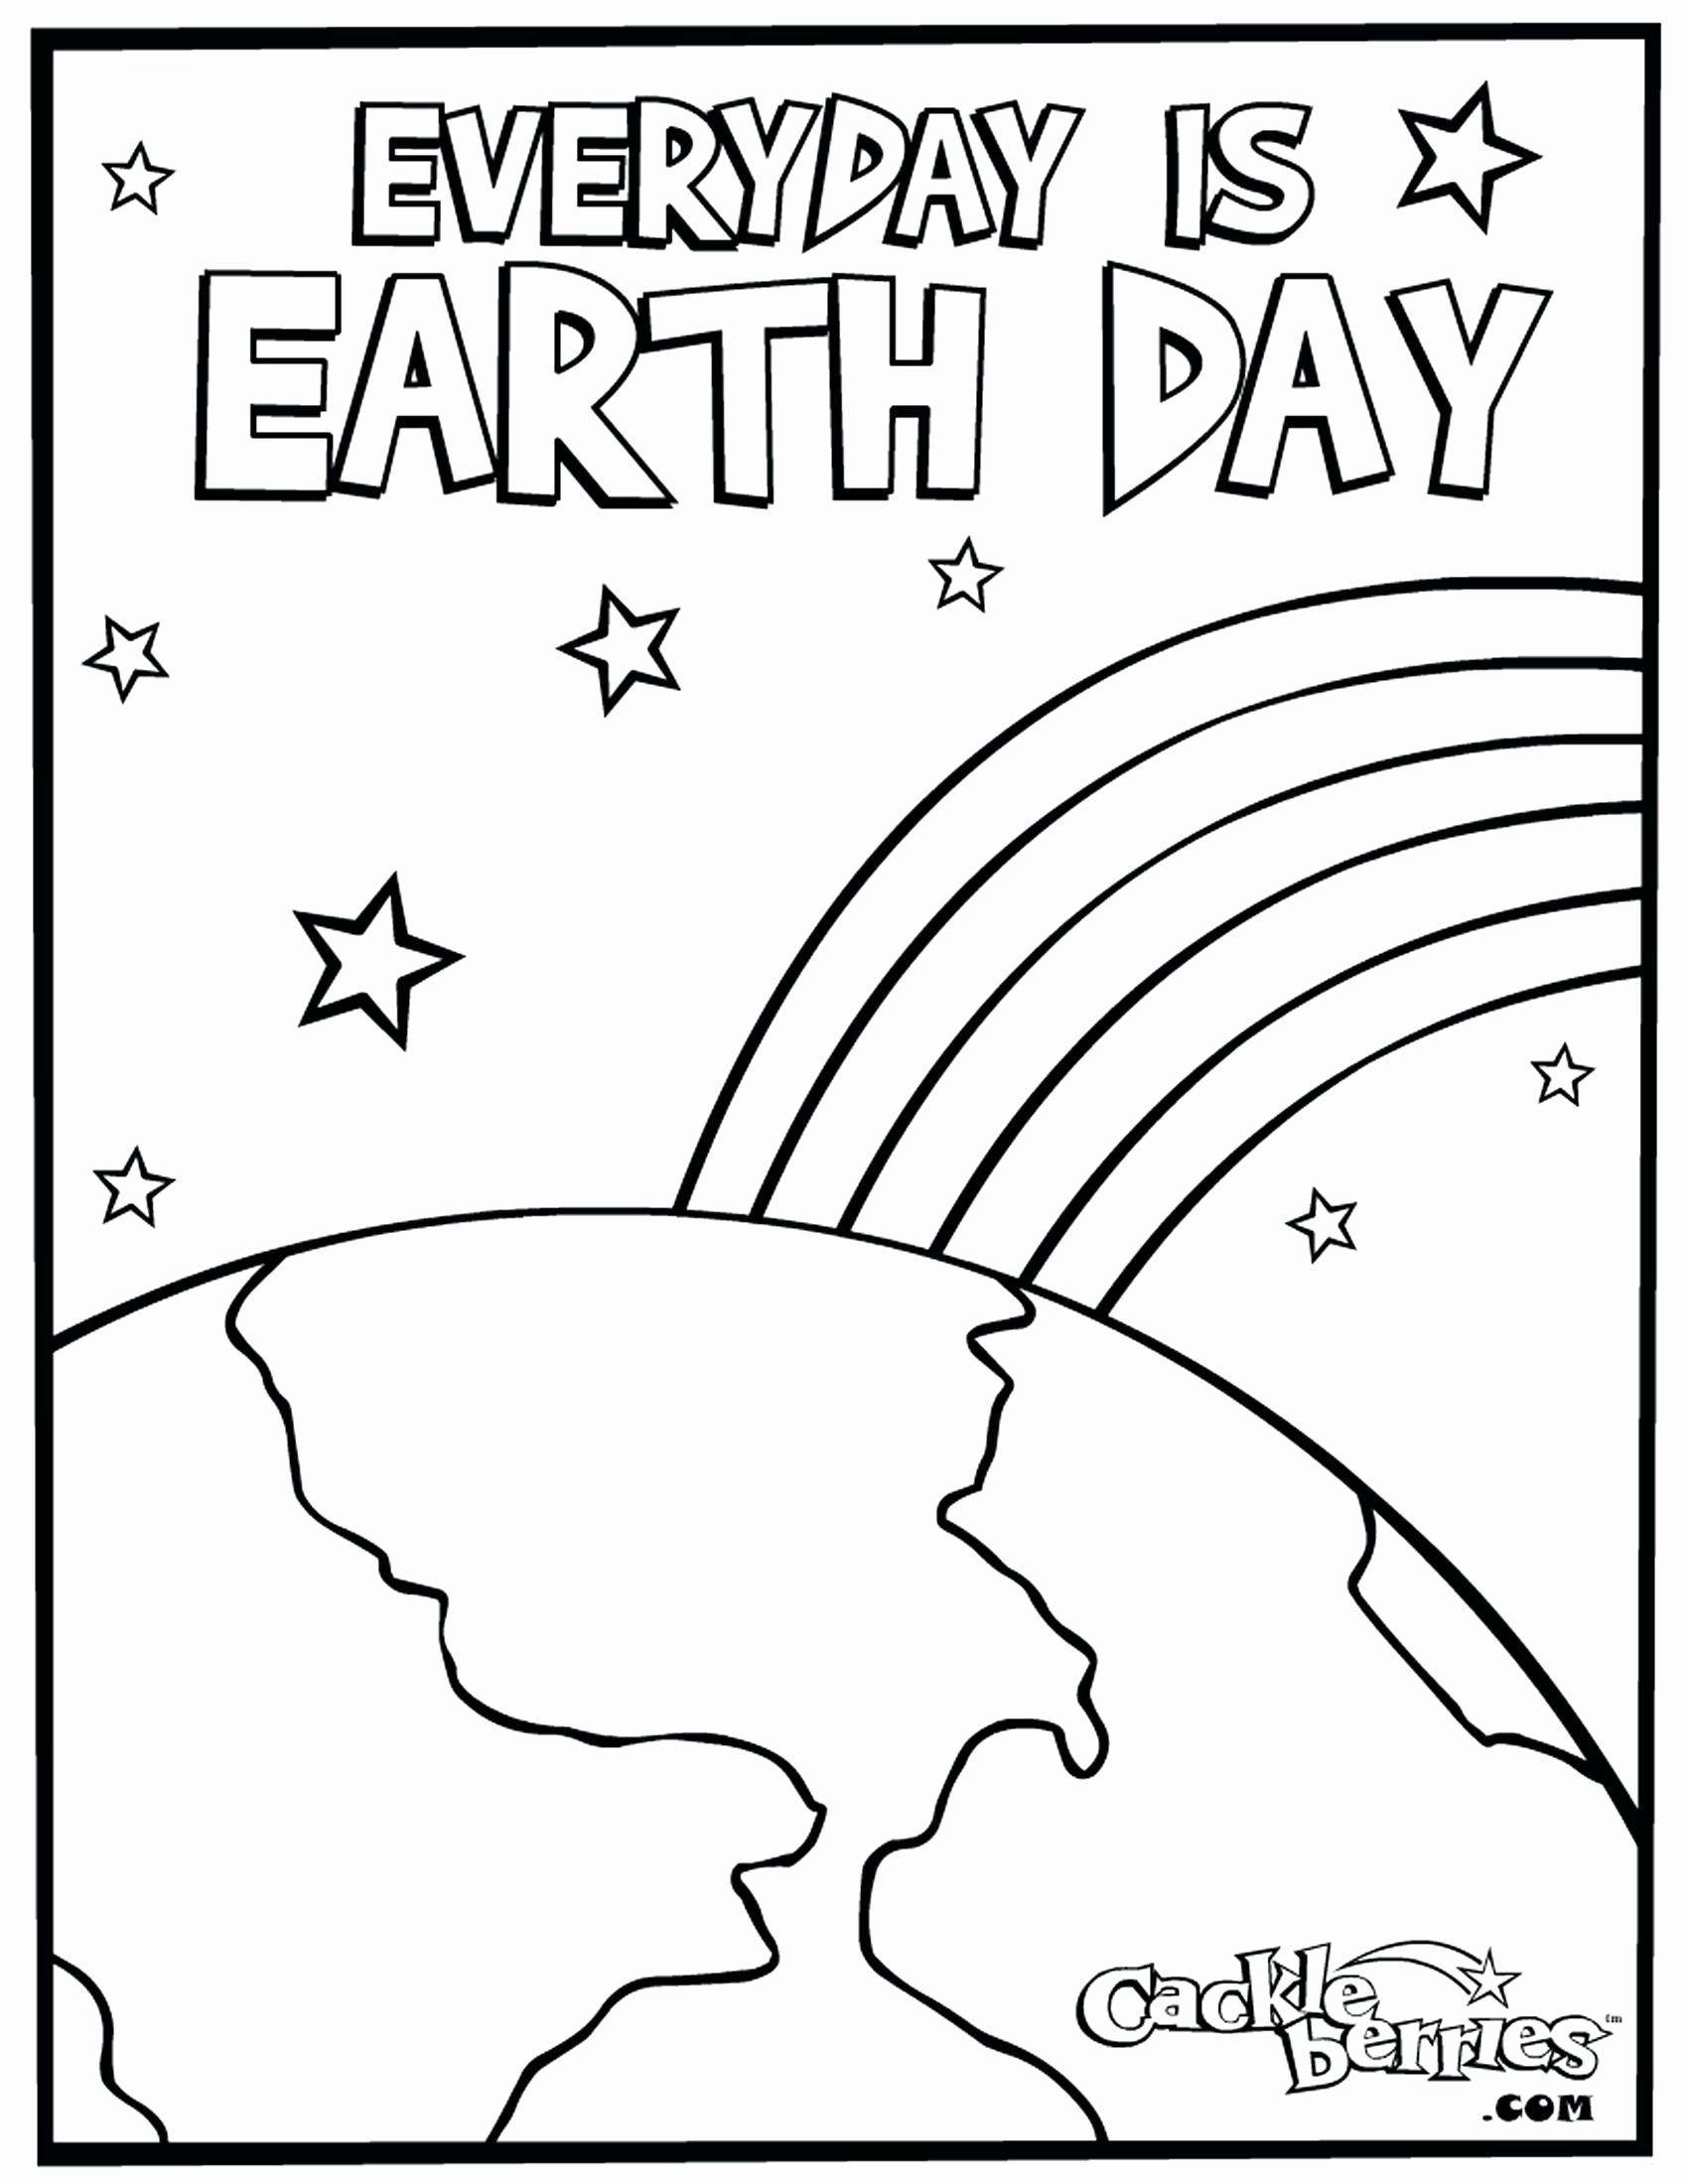 Ausmalbilder Zum Ausdrucken Earth Day Best Of Girl Scout Ausmalbilder Zum Ausdrucken Ganzes Level Coloring Day Earth Earthday In 2020 Earth Day Worksheets Earth Day Coloring Pages Earth Coloring Pages